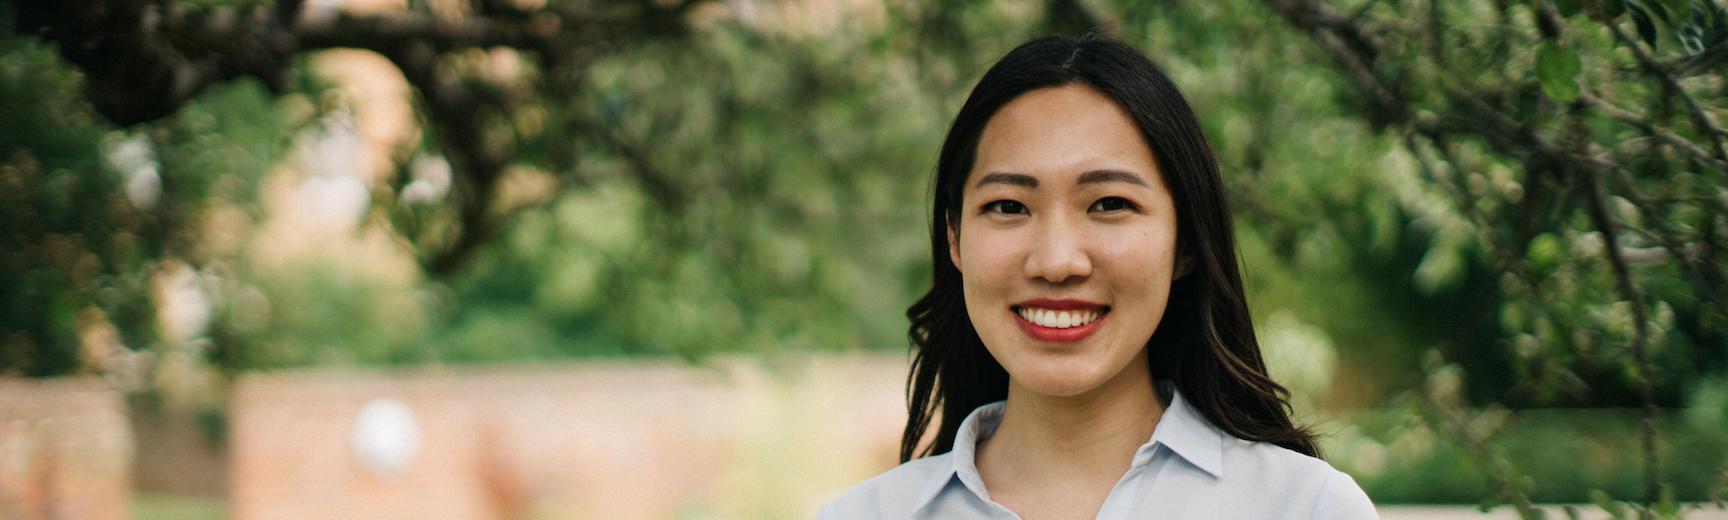 Profile photo of Siyang Zhou, who is smiling